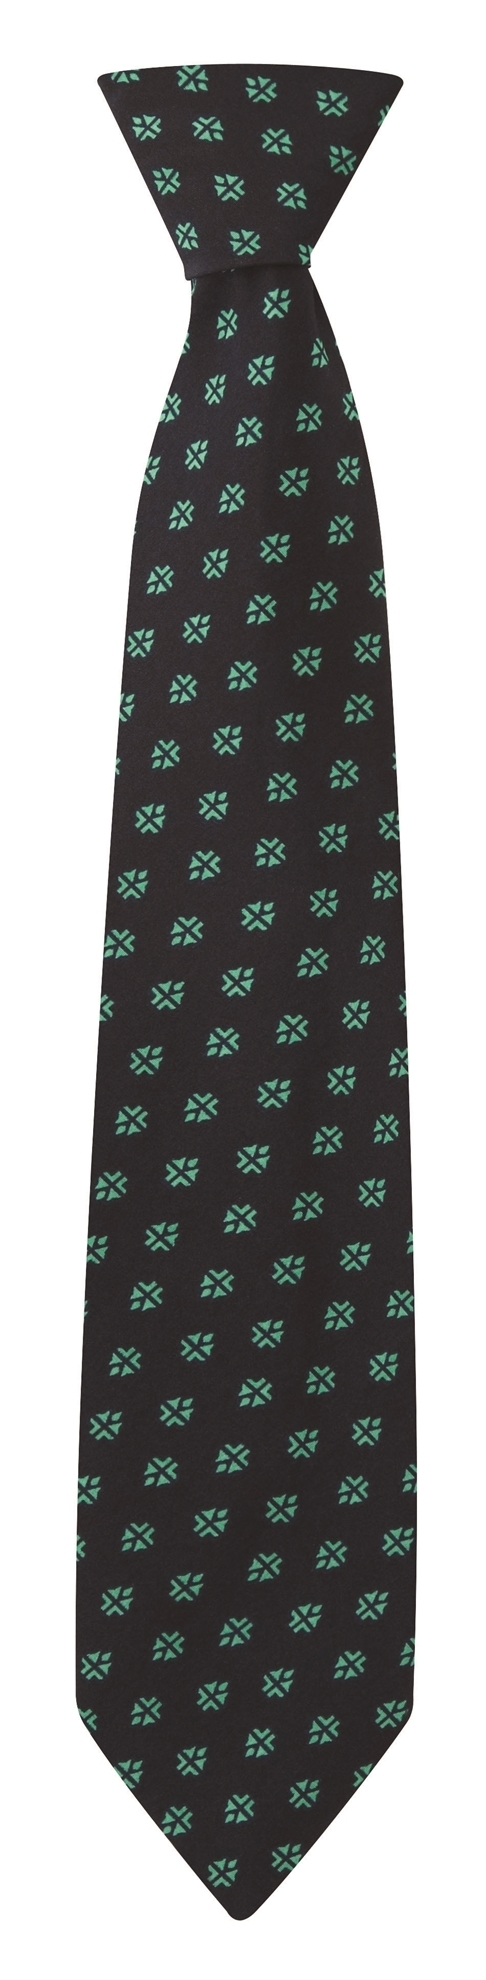 Picture of Print Tie - Navy/Aqua Fleur Print